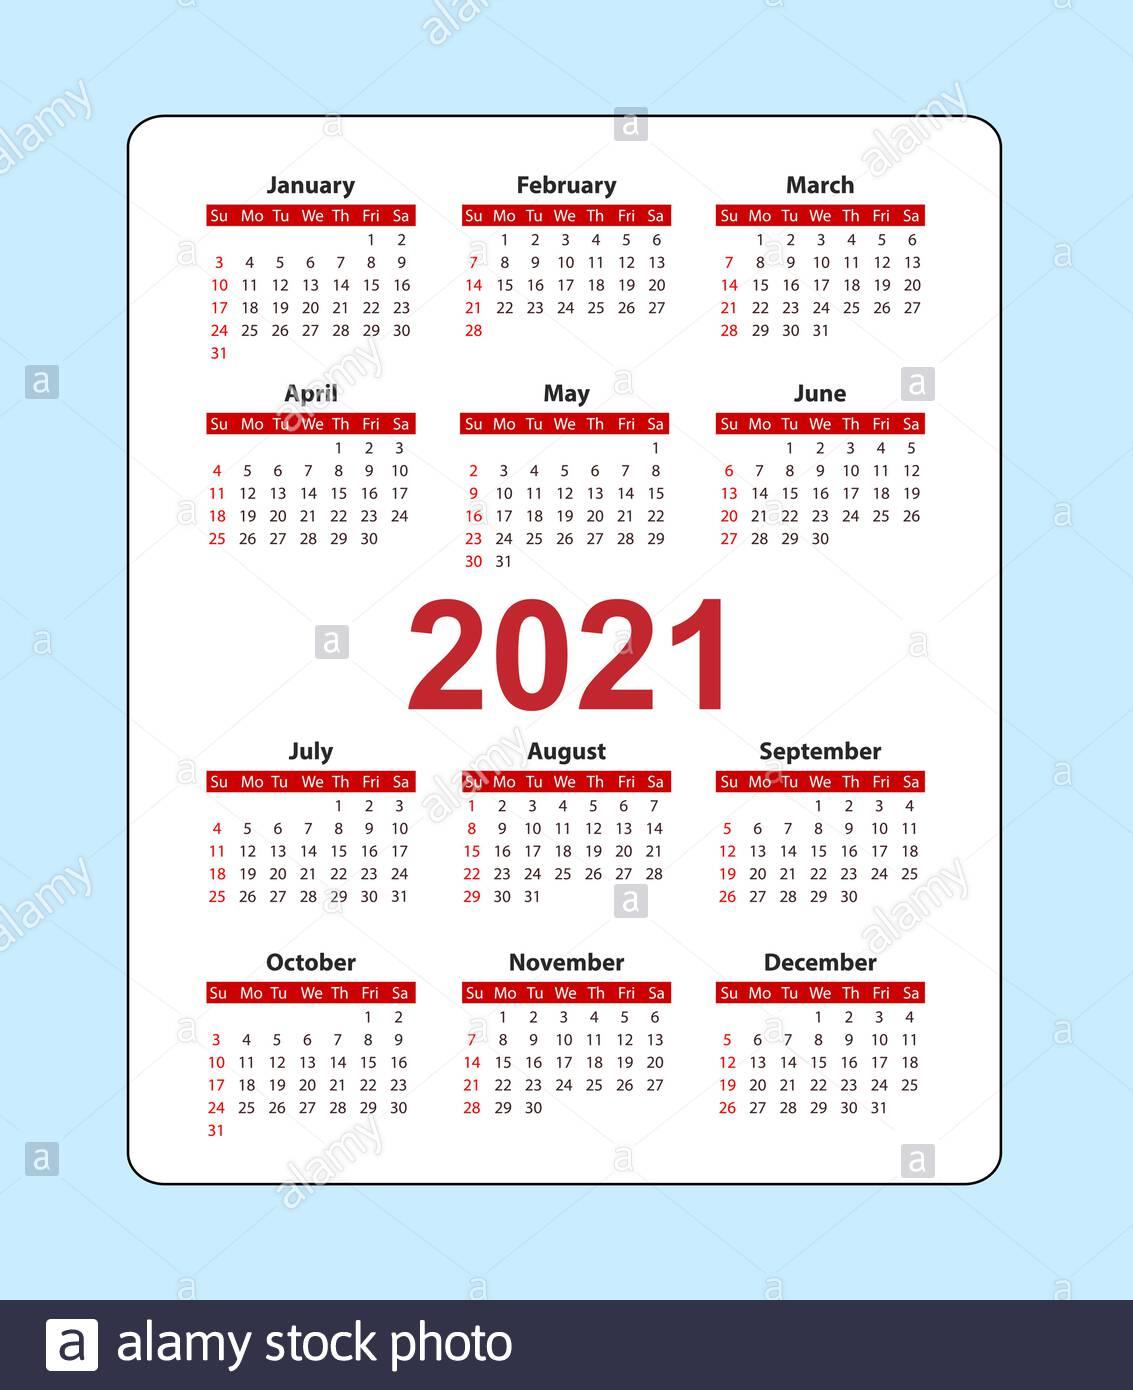 Vertical Pocket Calendar 2021 Year. Week Starts From Sunday in 2021-2021 2 Year Pocket Planner: 2 Year